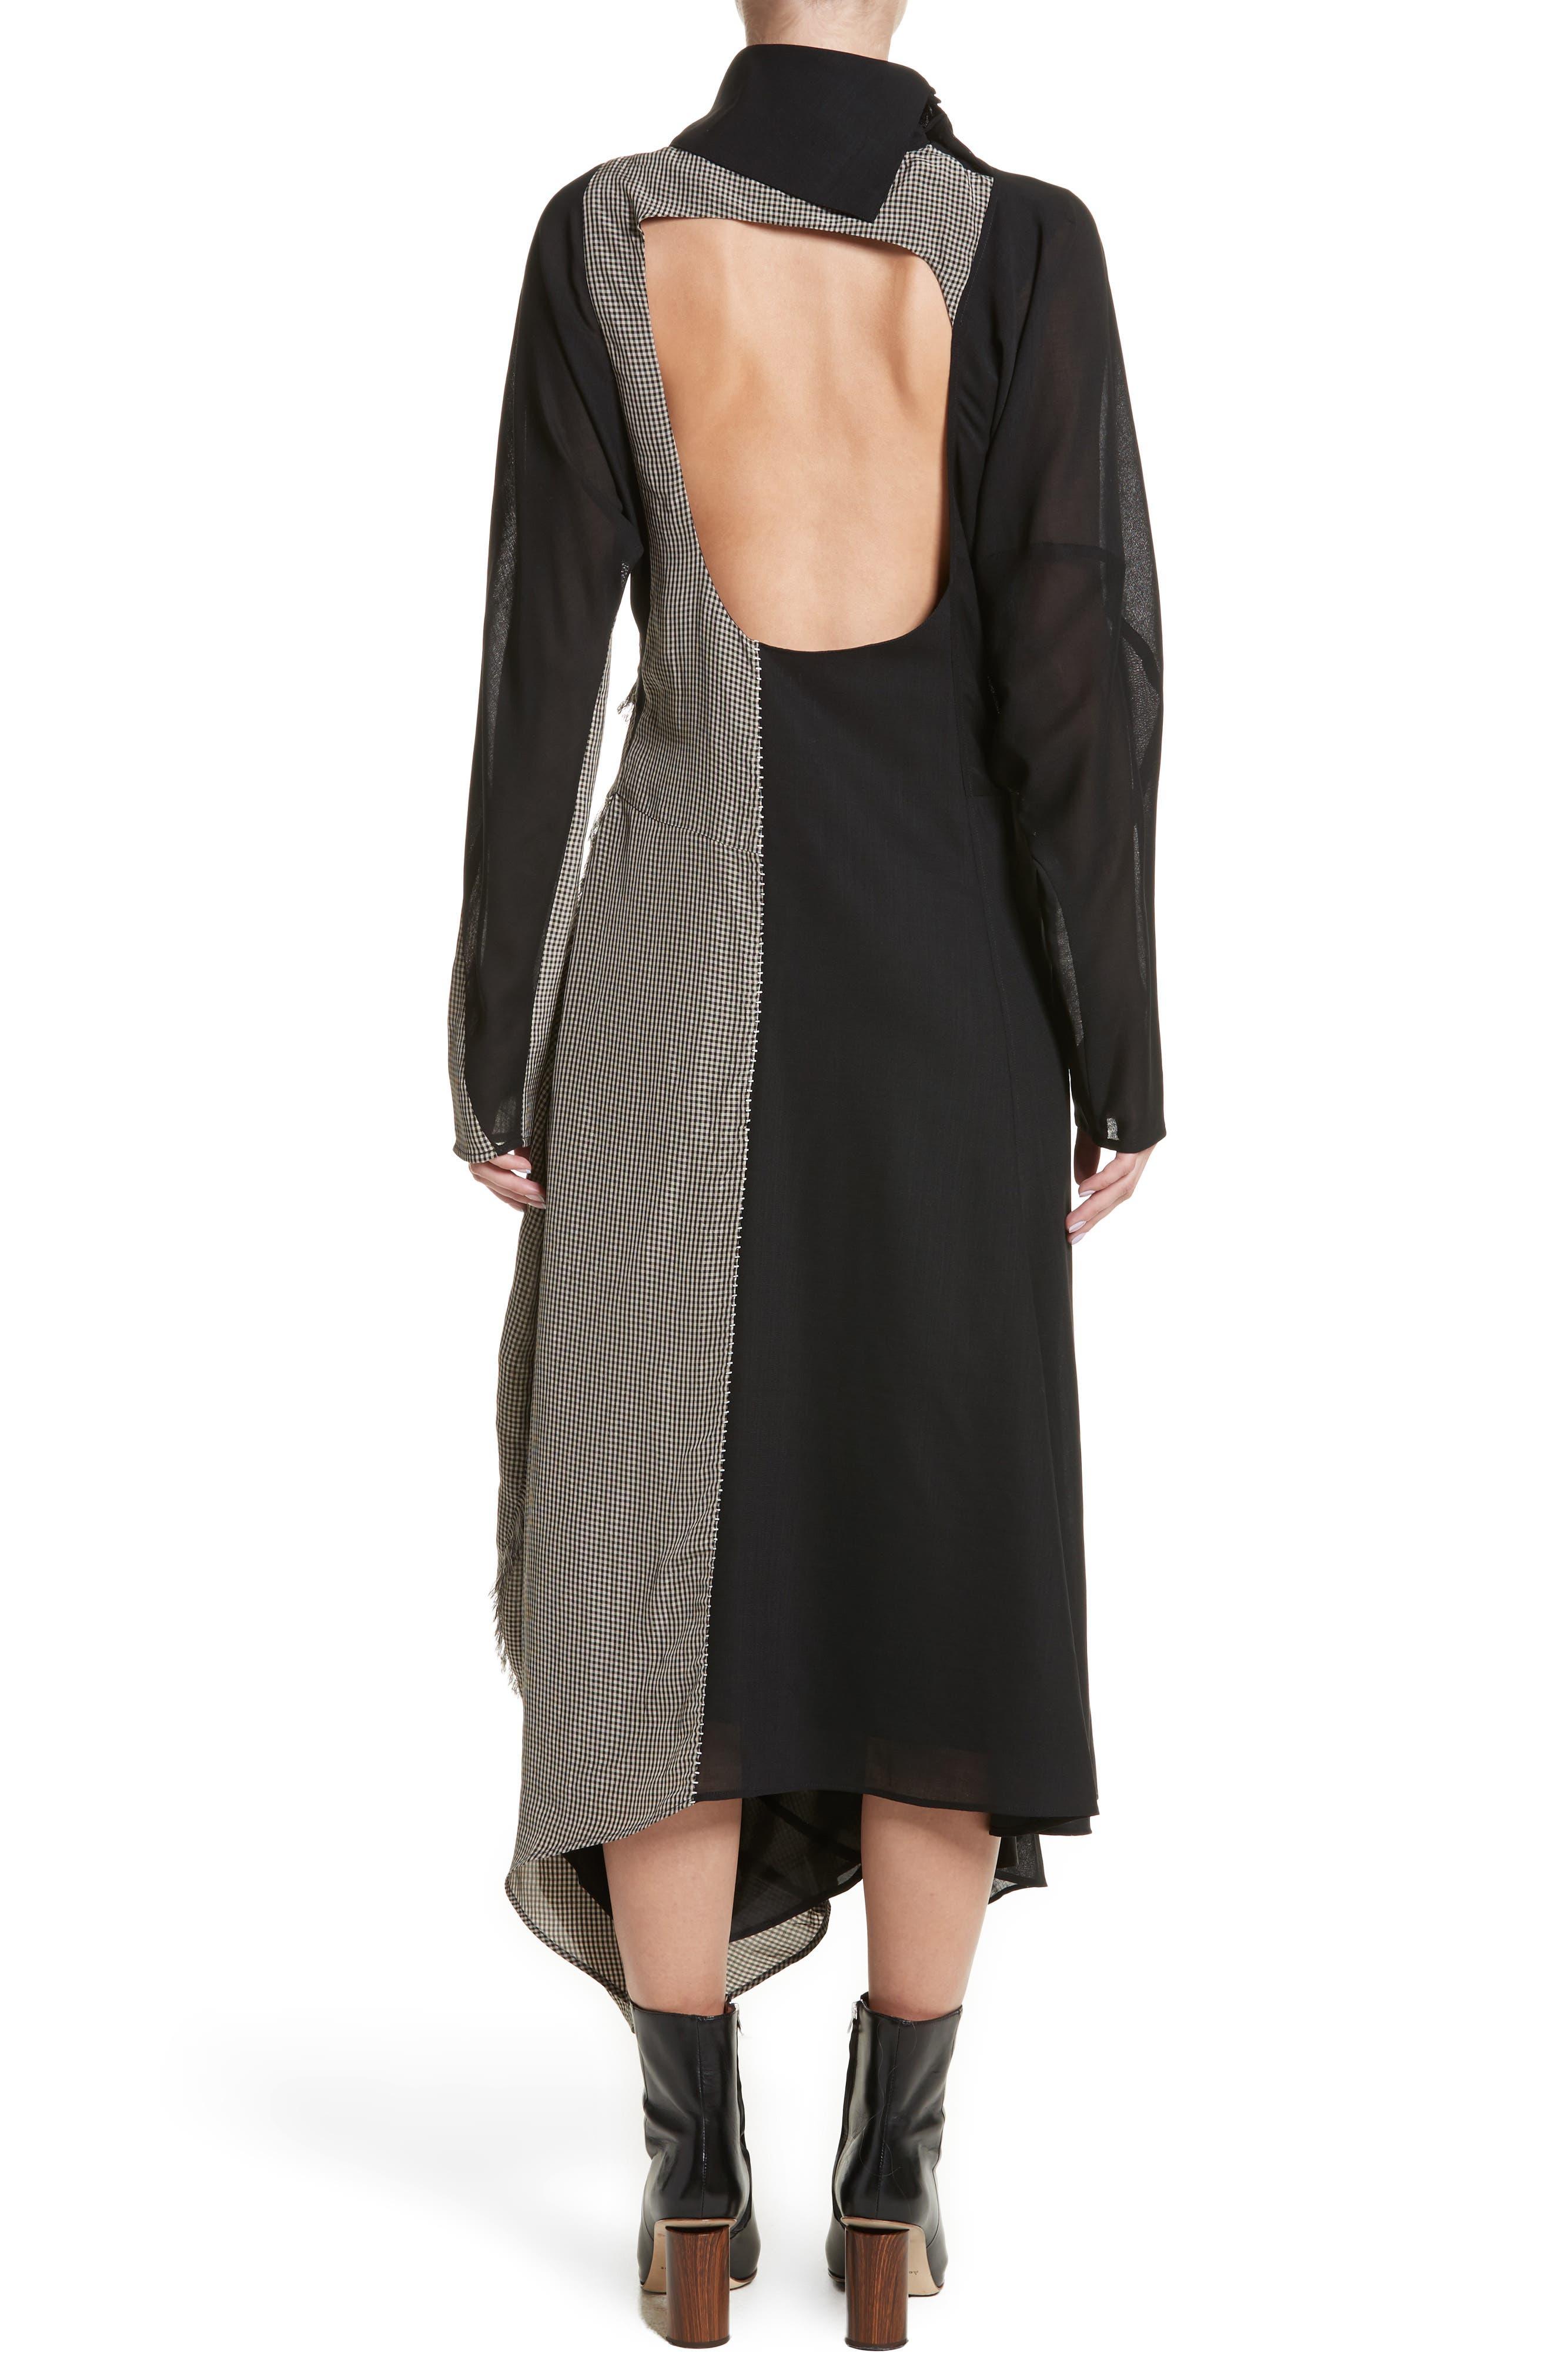 Dragica Mixed Media Dress,                             Alternate thumbnail 2, color,                             Black